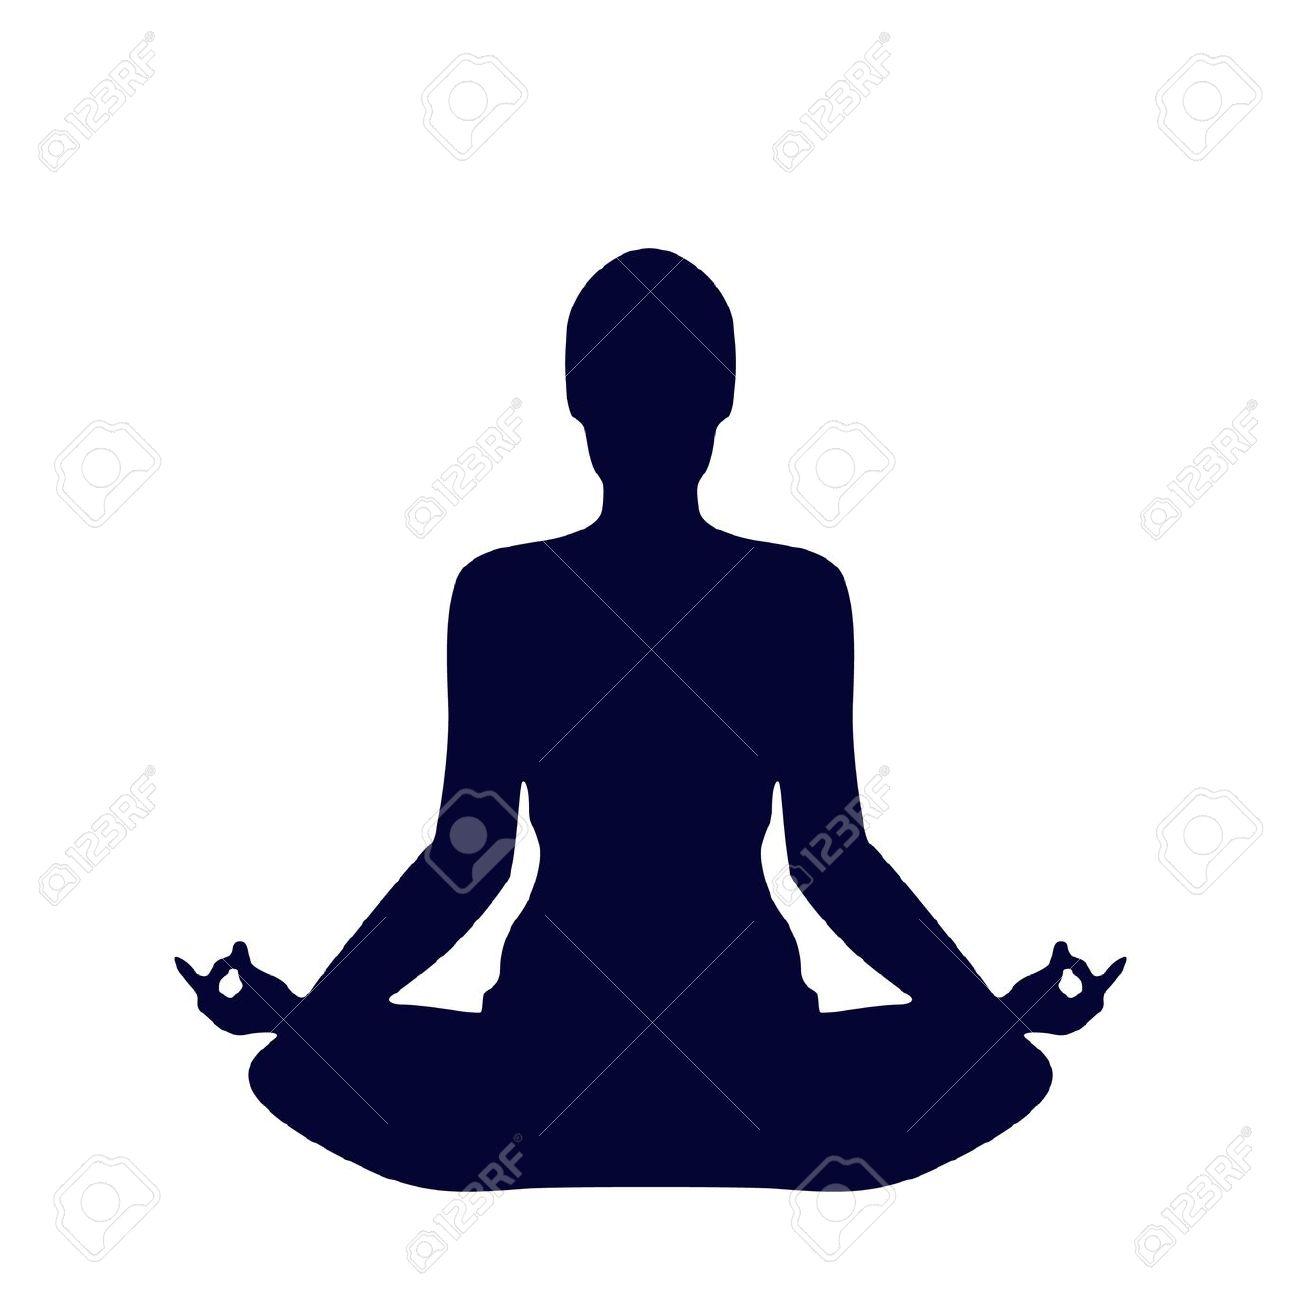 744 Meditation free clipart.